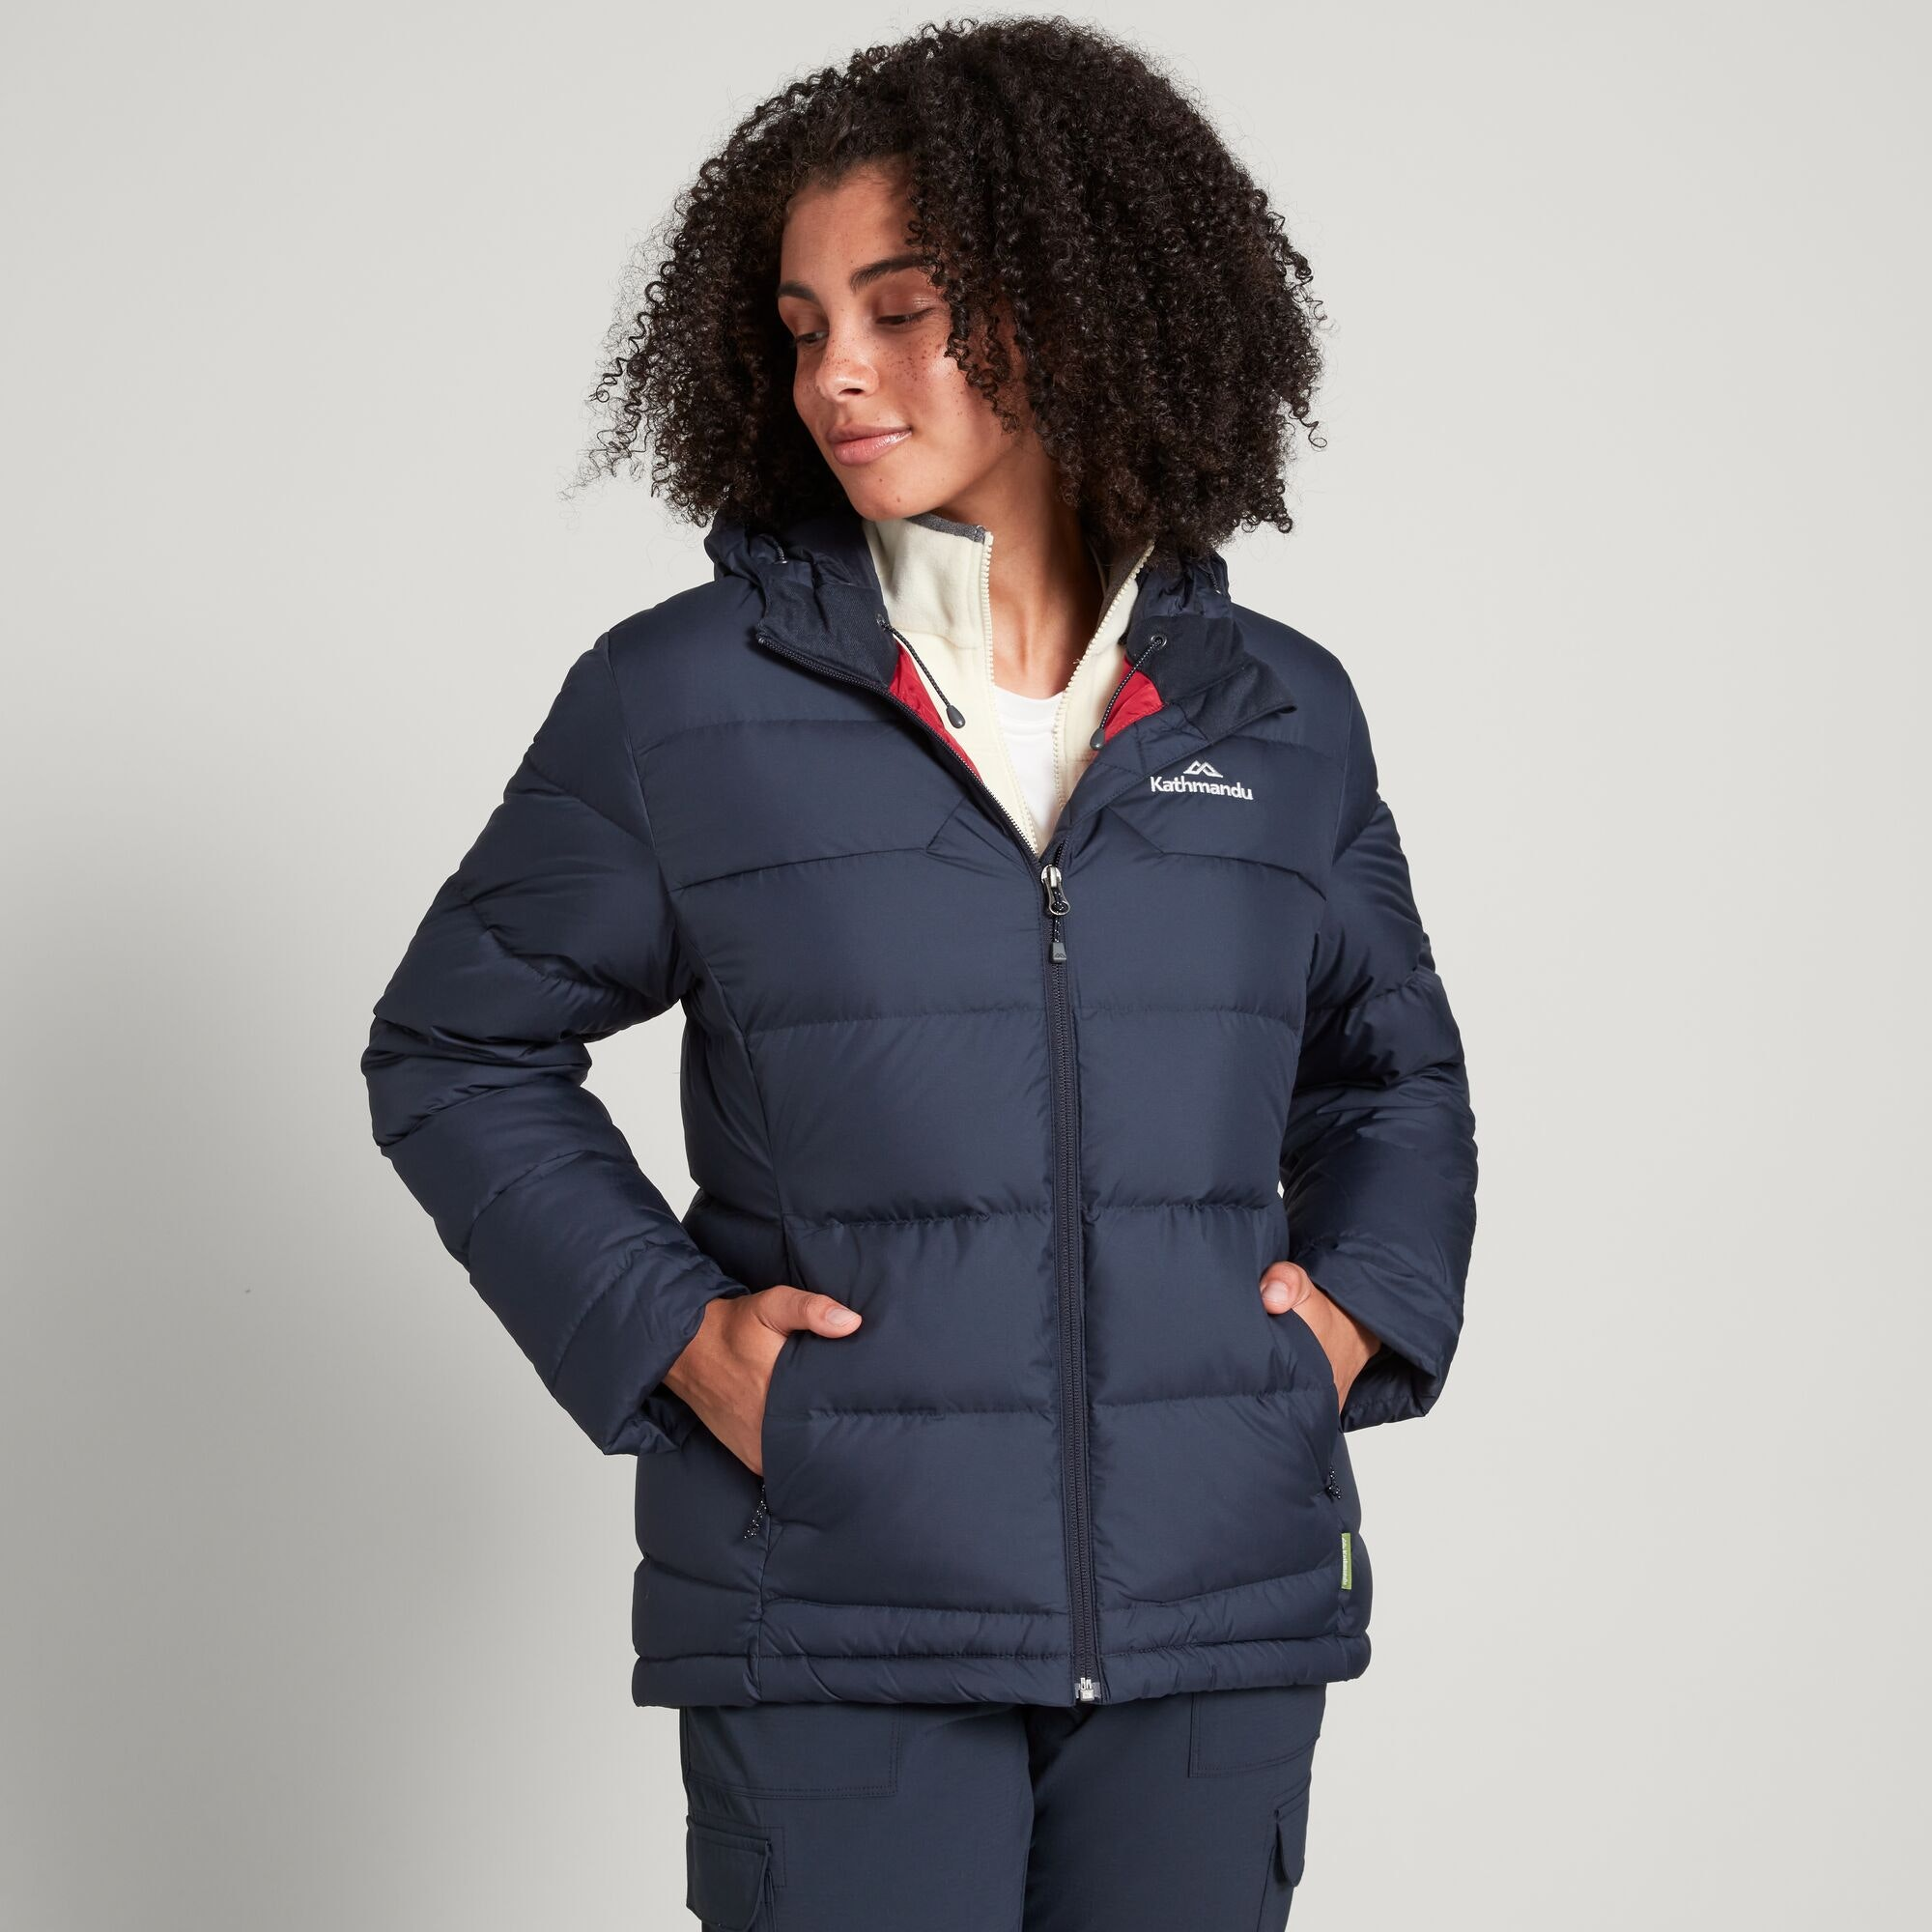 thumbnail 13 - NEW Kathmandu Epiq Womens Hooded Down Puffer 600 Fill Warm Outdoor Winter Jacket